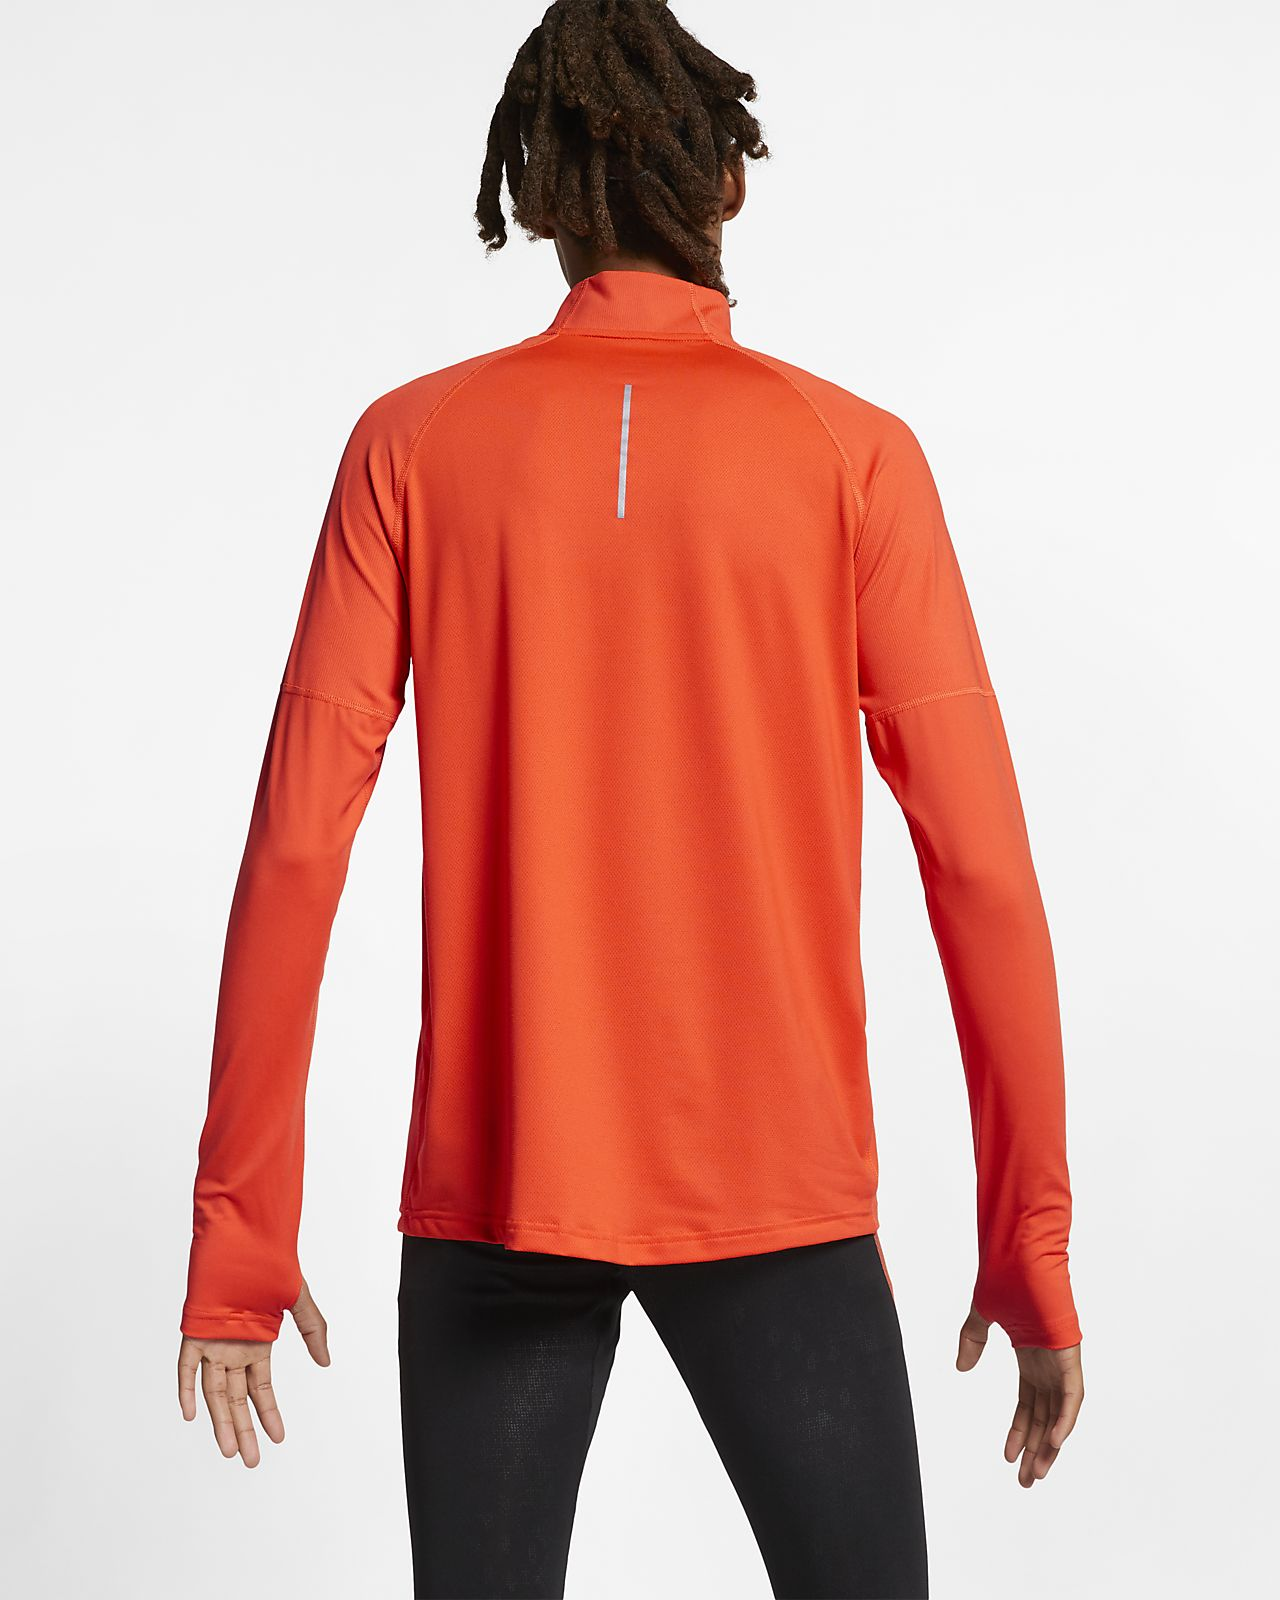 0bd128b8b Nike Element Men's 1/2-Zip Running Top. Nike.com